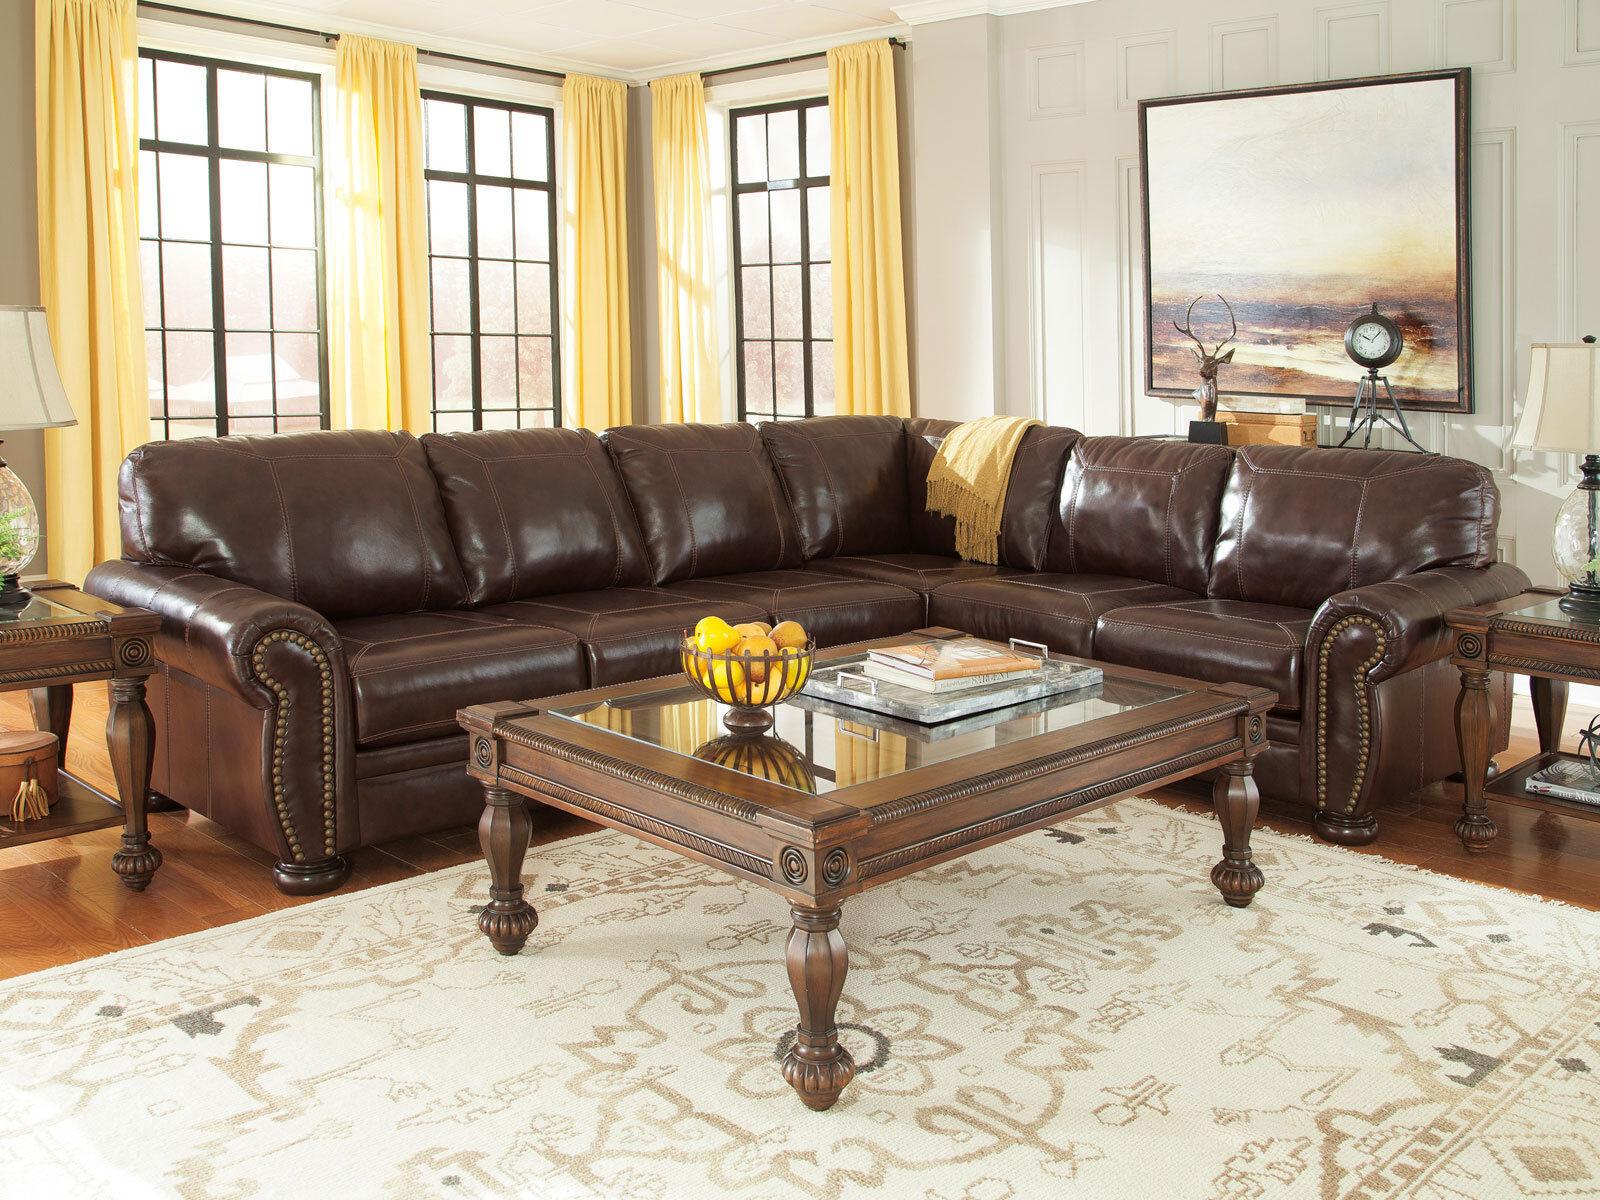 Old World Formal Living Room Brown Leather Large Sofa